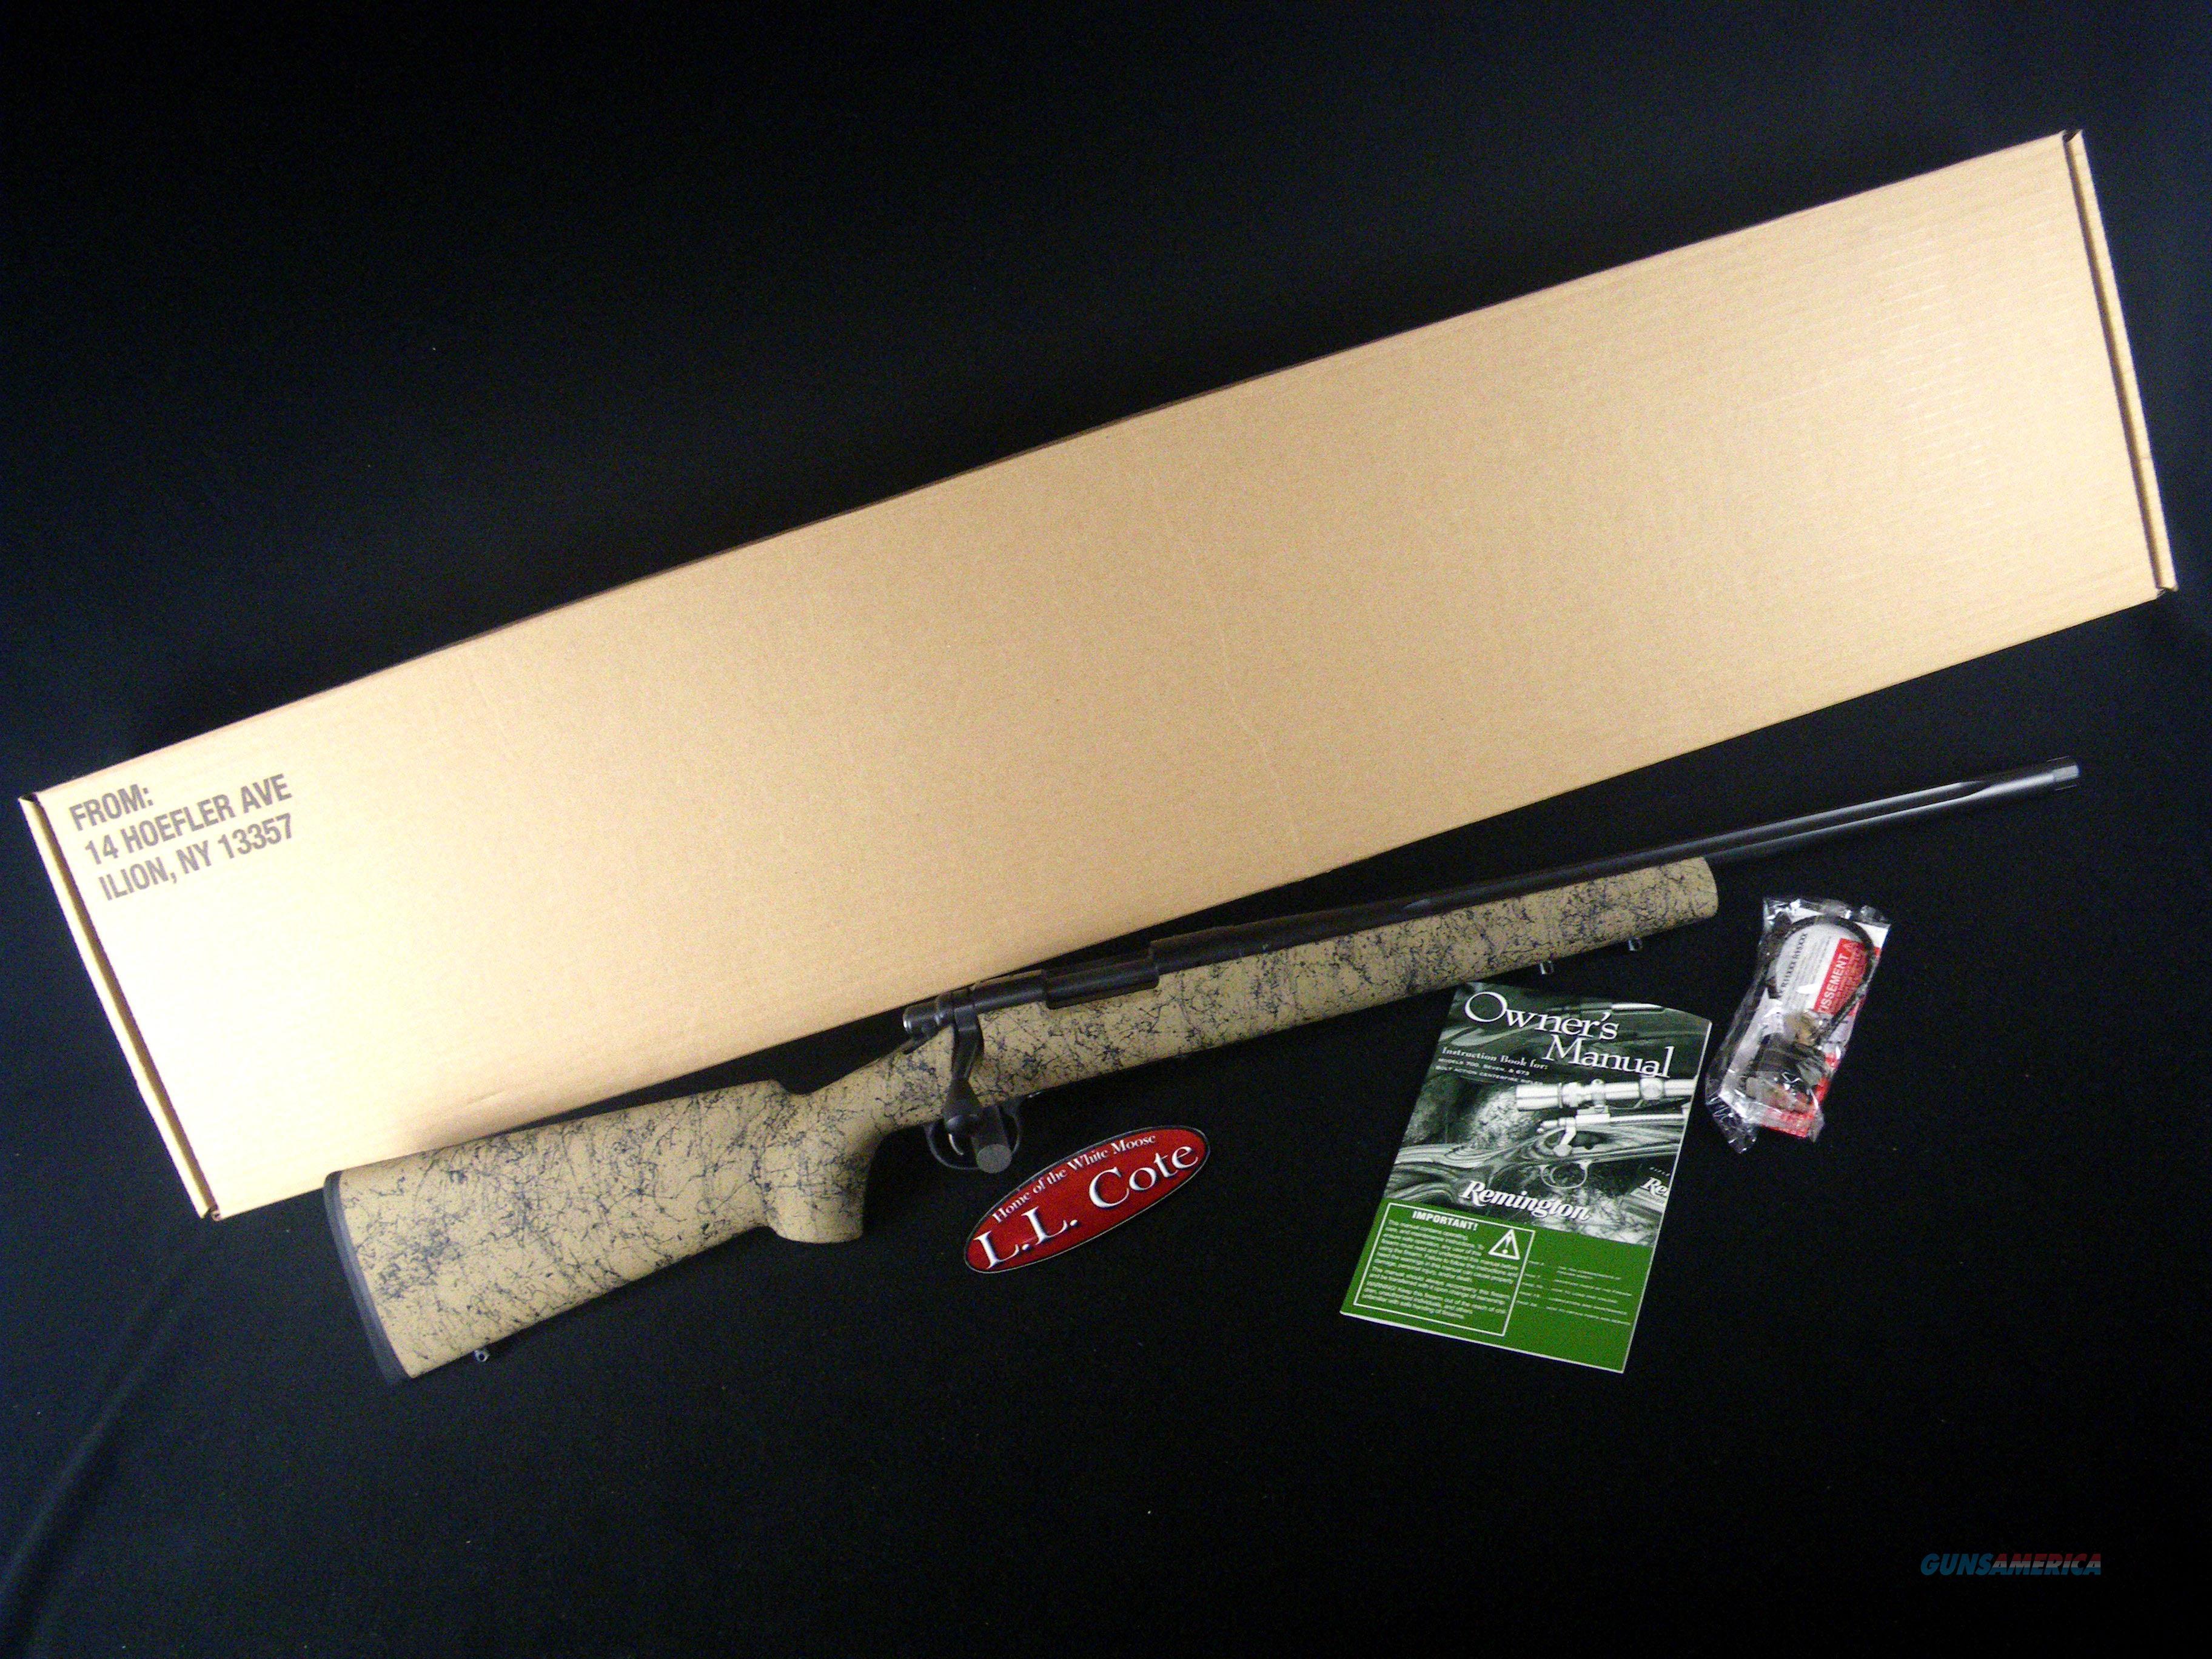 "Remington 700 5-R Gen 2 6.5 Creed 24"" NEW 85198  Guns > Rifles > Remington Rifles - Modern > Model 700 > Sporting"